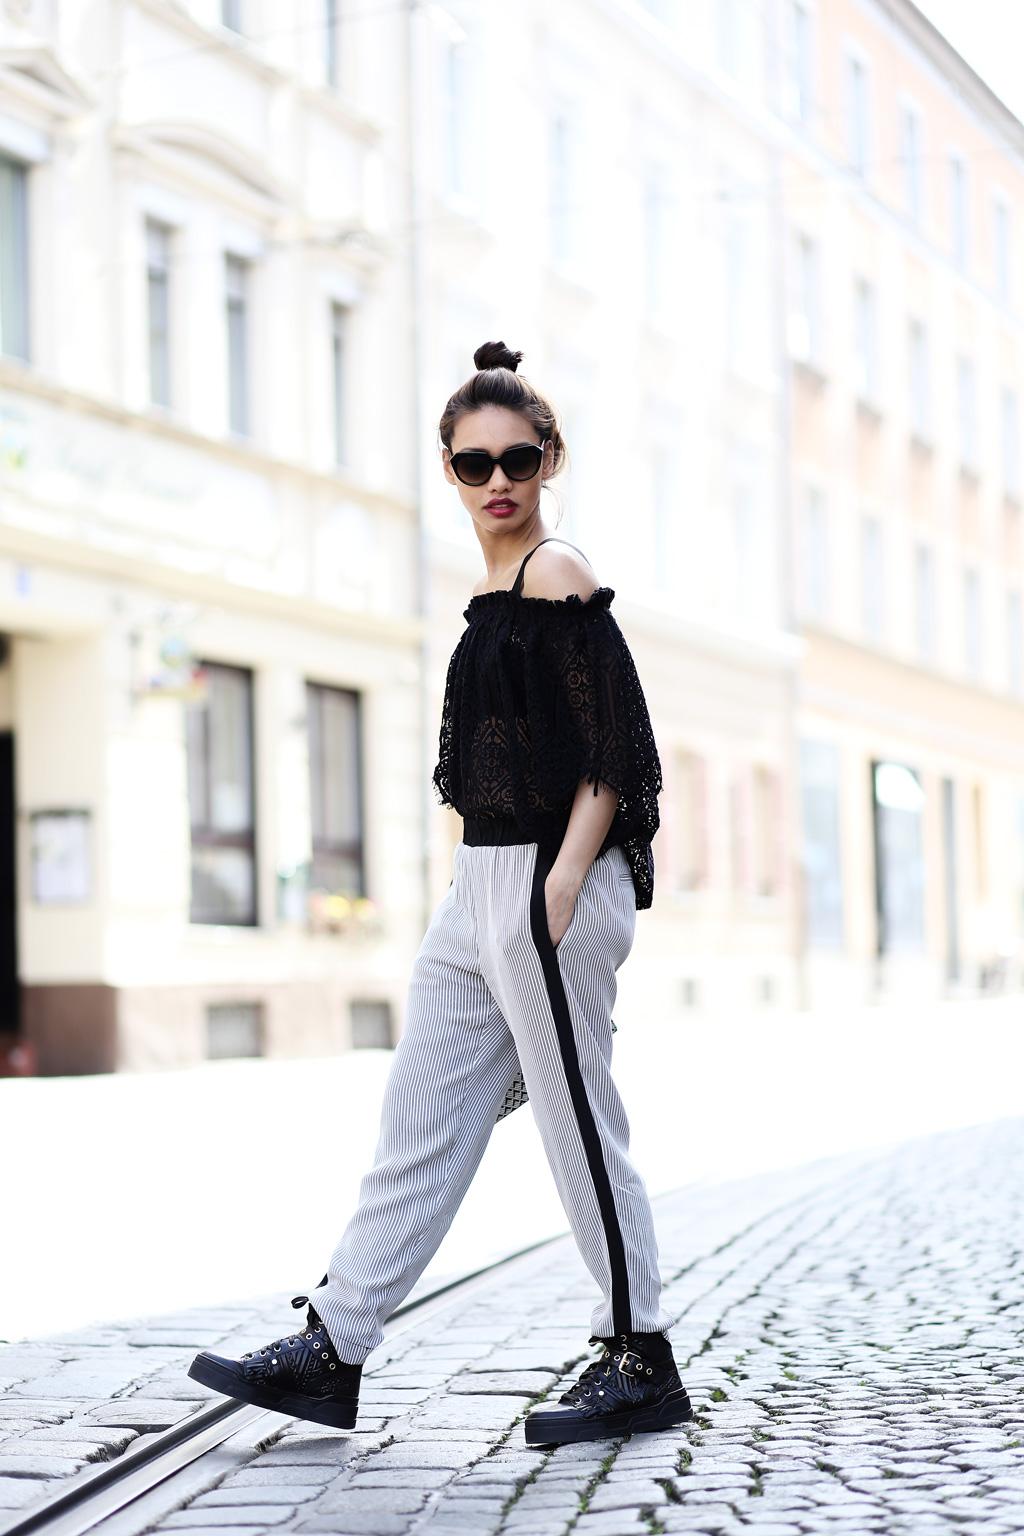 thefashionanarchy_anniep._outfit_style_look_spitze_lace_munichblogger_blogger_fashionblogger_munich_muenchen_fashionblogger_ash_sneaker_4